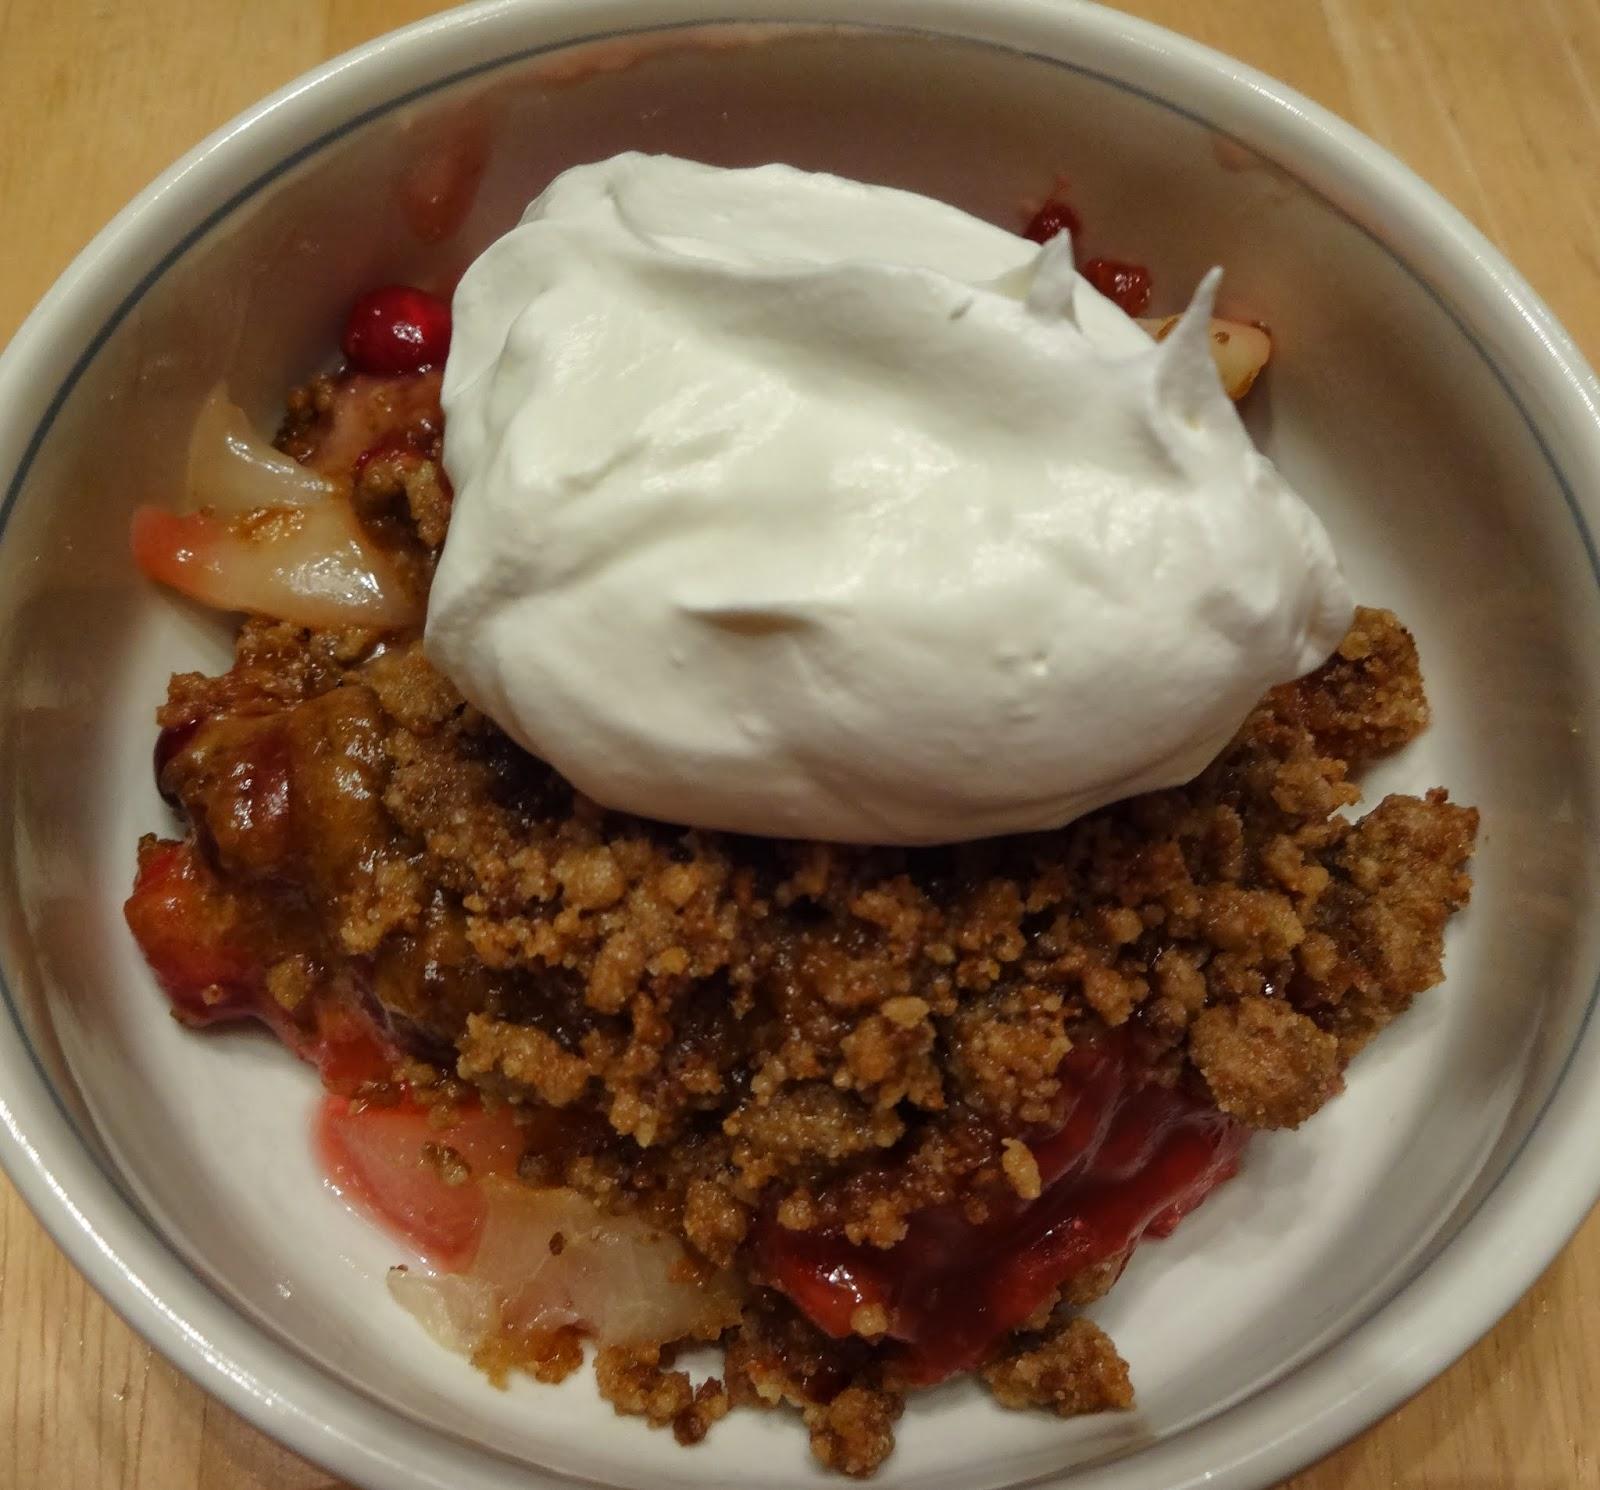 Shenandoah Gateway Farm: Pear, Cranberry and Gingersnap Crumble